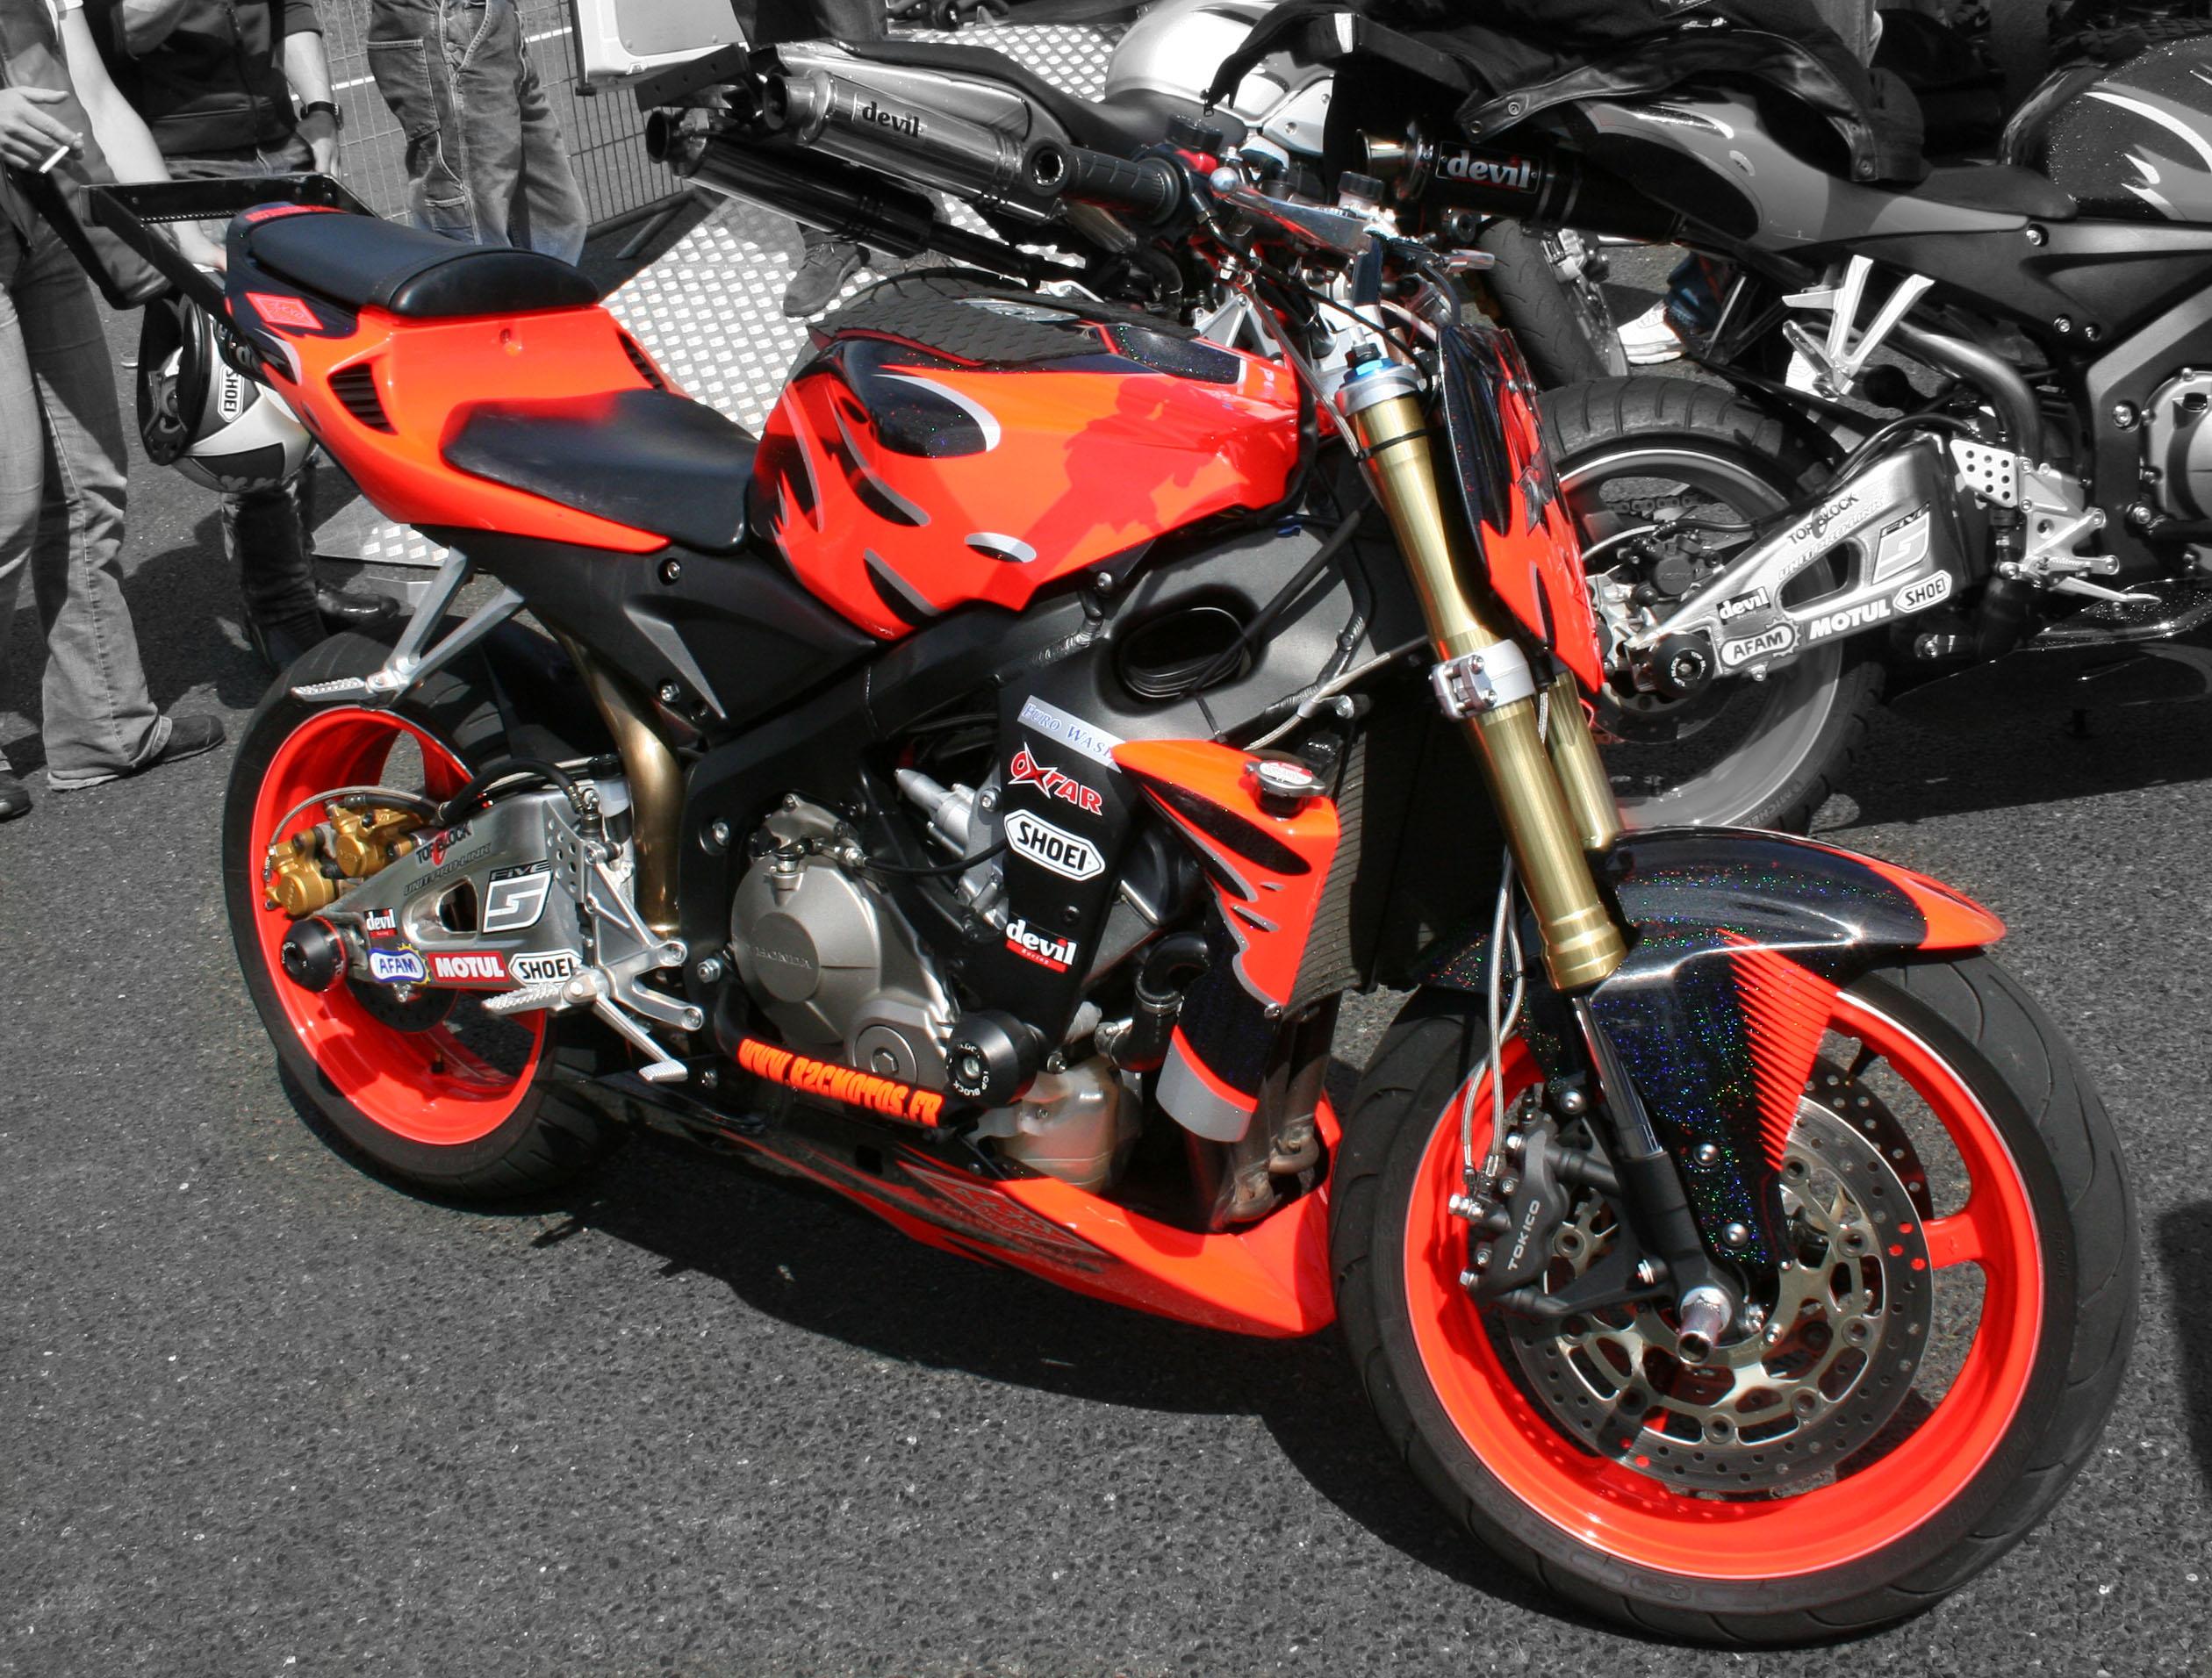 hot moto speed bikes stunts. Black Bedroom Furniture Sets. Home Design Ideas